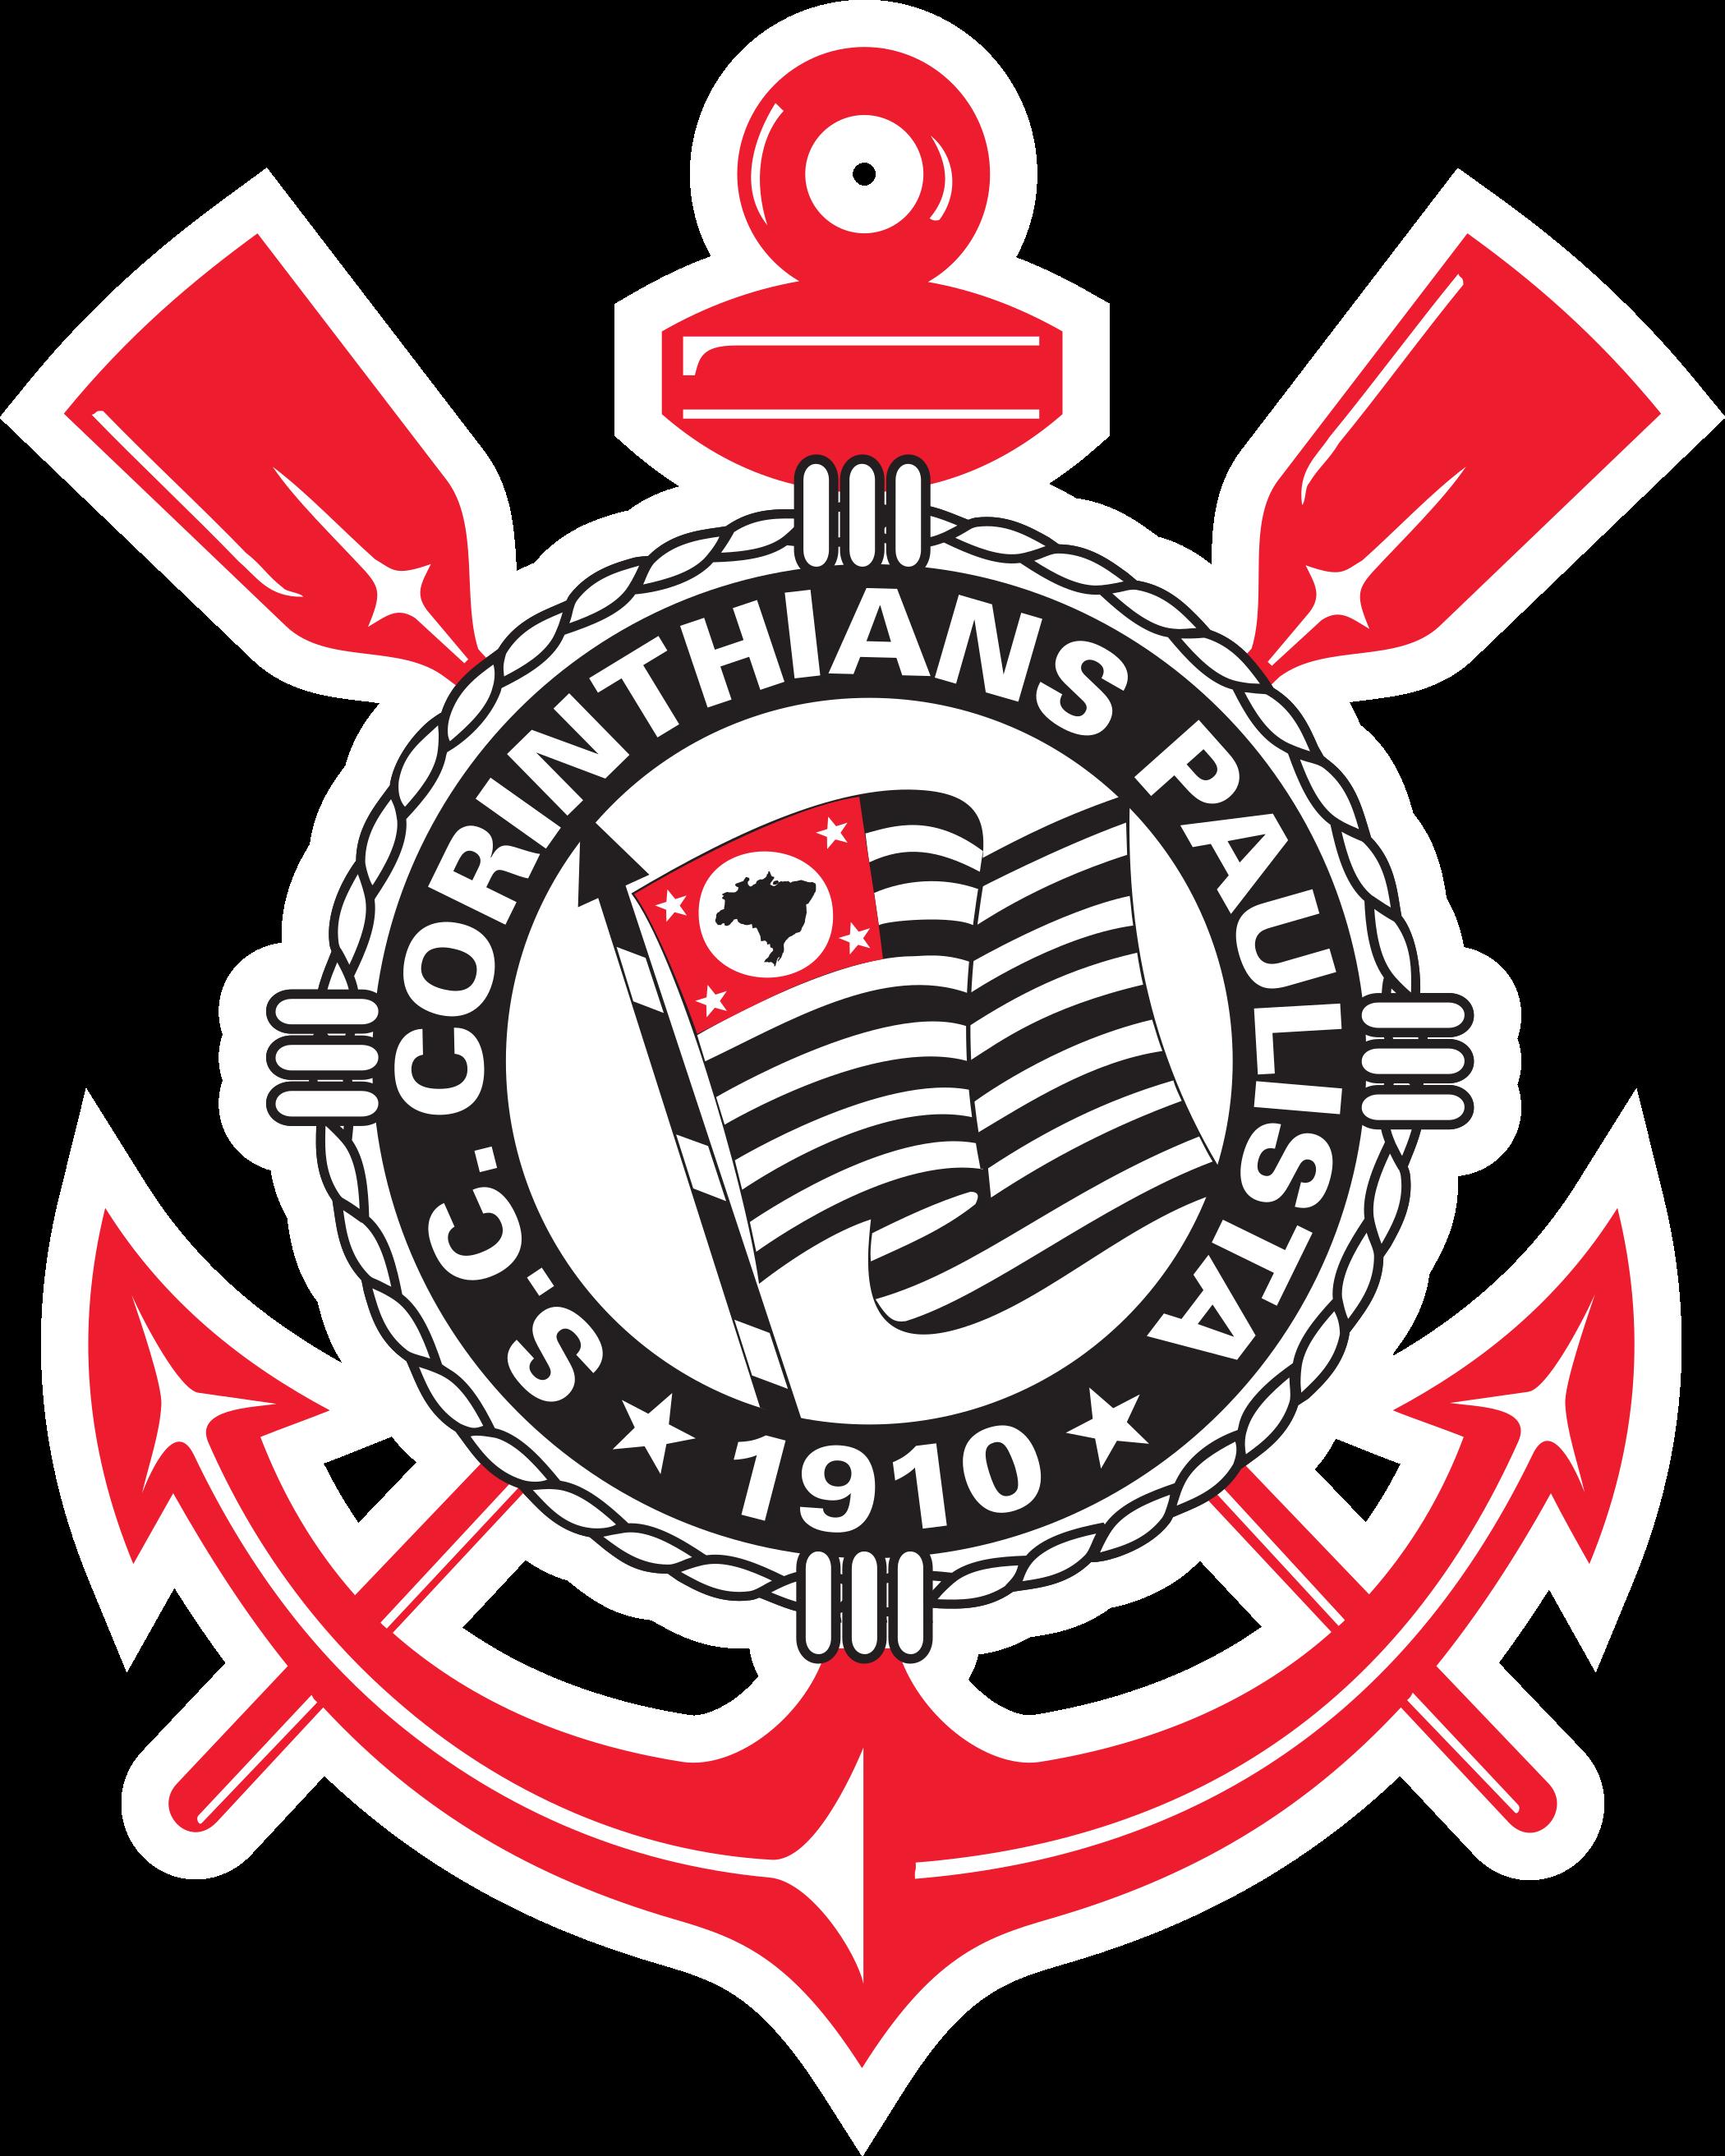 Corinthians logo escudo 1 - Corinthians Logo - Escudo